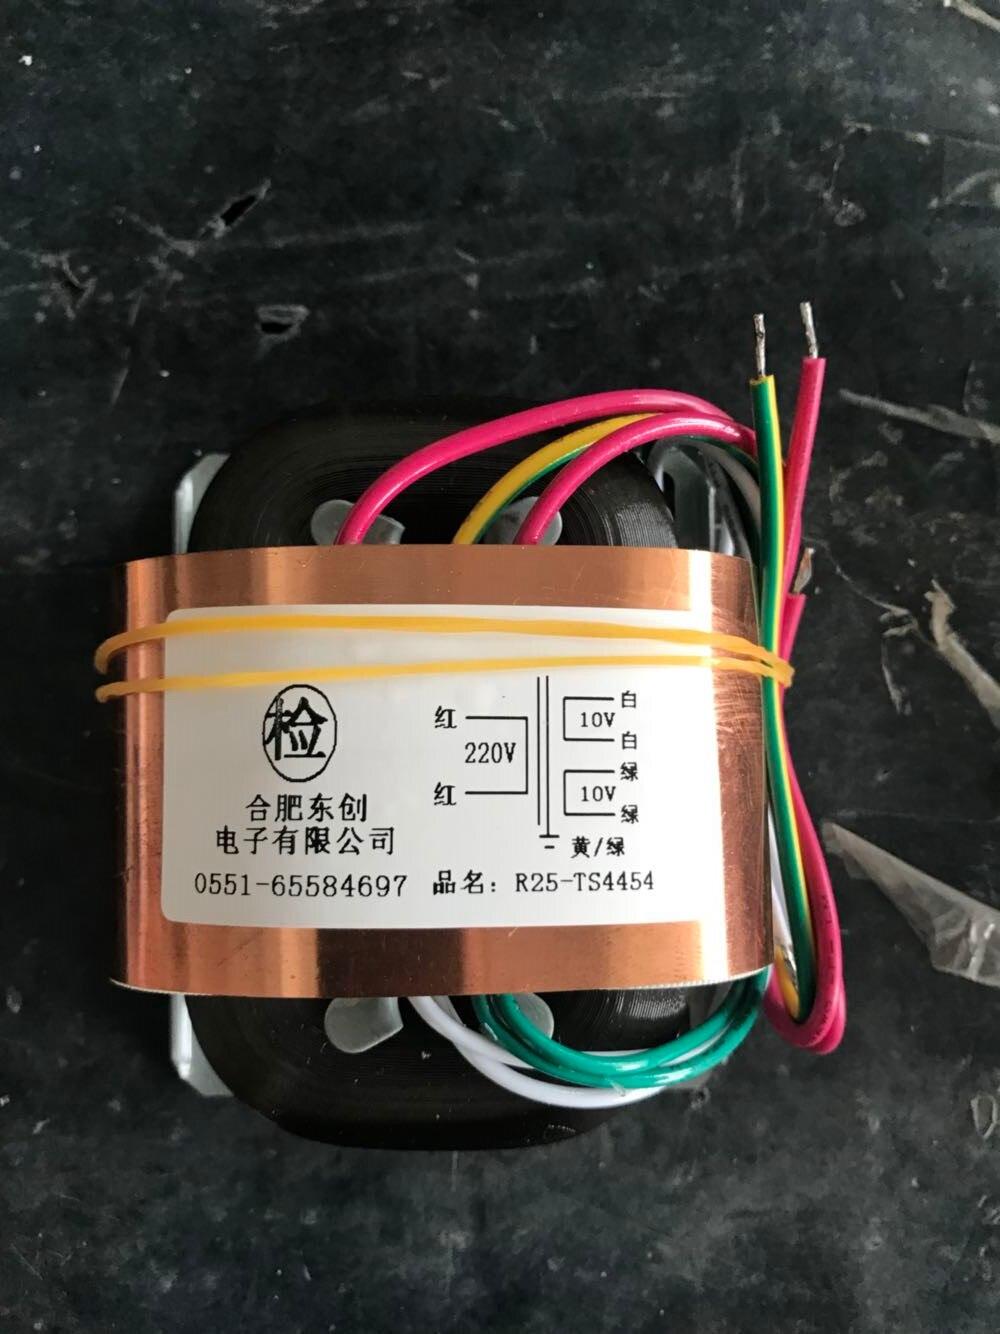 10V 1.5A 10V 1.5A Transformer R Core R25 custom transformer 220V 30VA with copper shield for Pre-decoder HIFI power supply mt8227aaku mt8227aaku bmsl